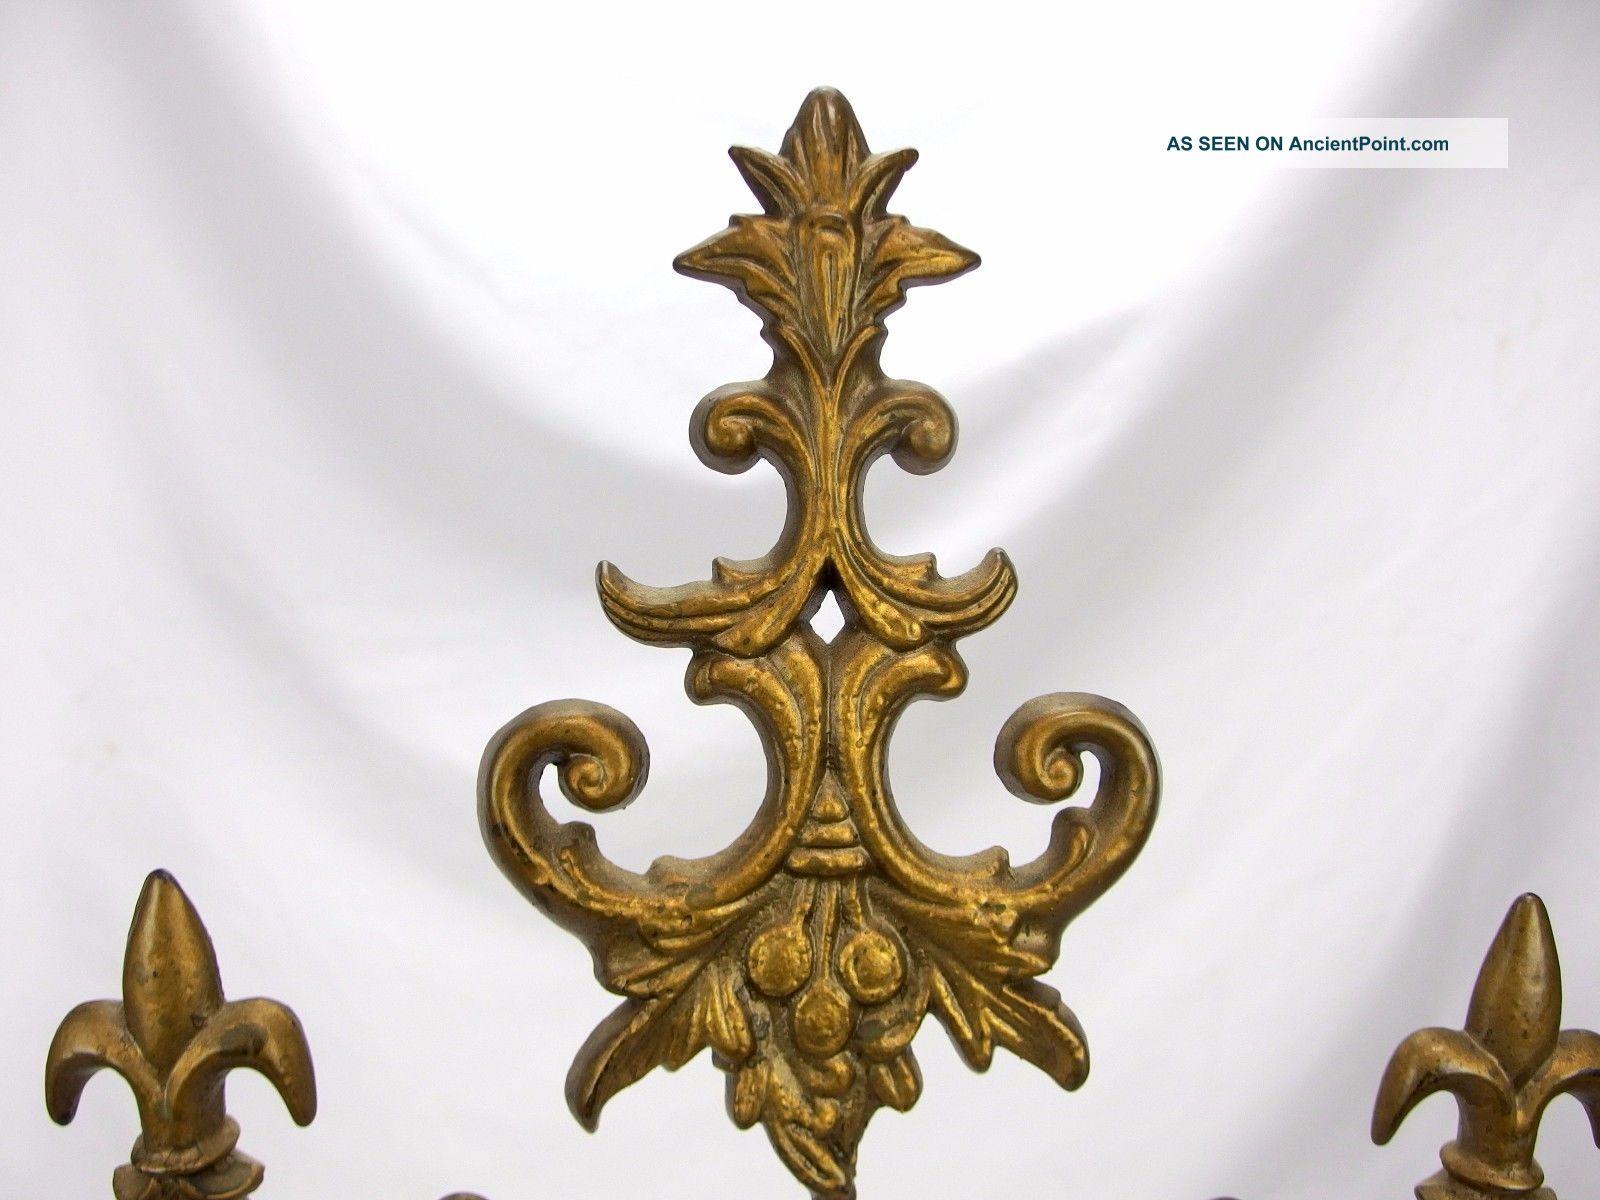 Antique Gold Gilt Cast Iron 3 Panel Fire Screen Fleur De Lis Molded Glass Hearth Ware photo